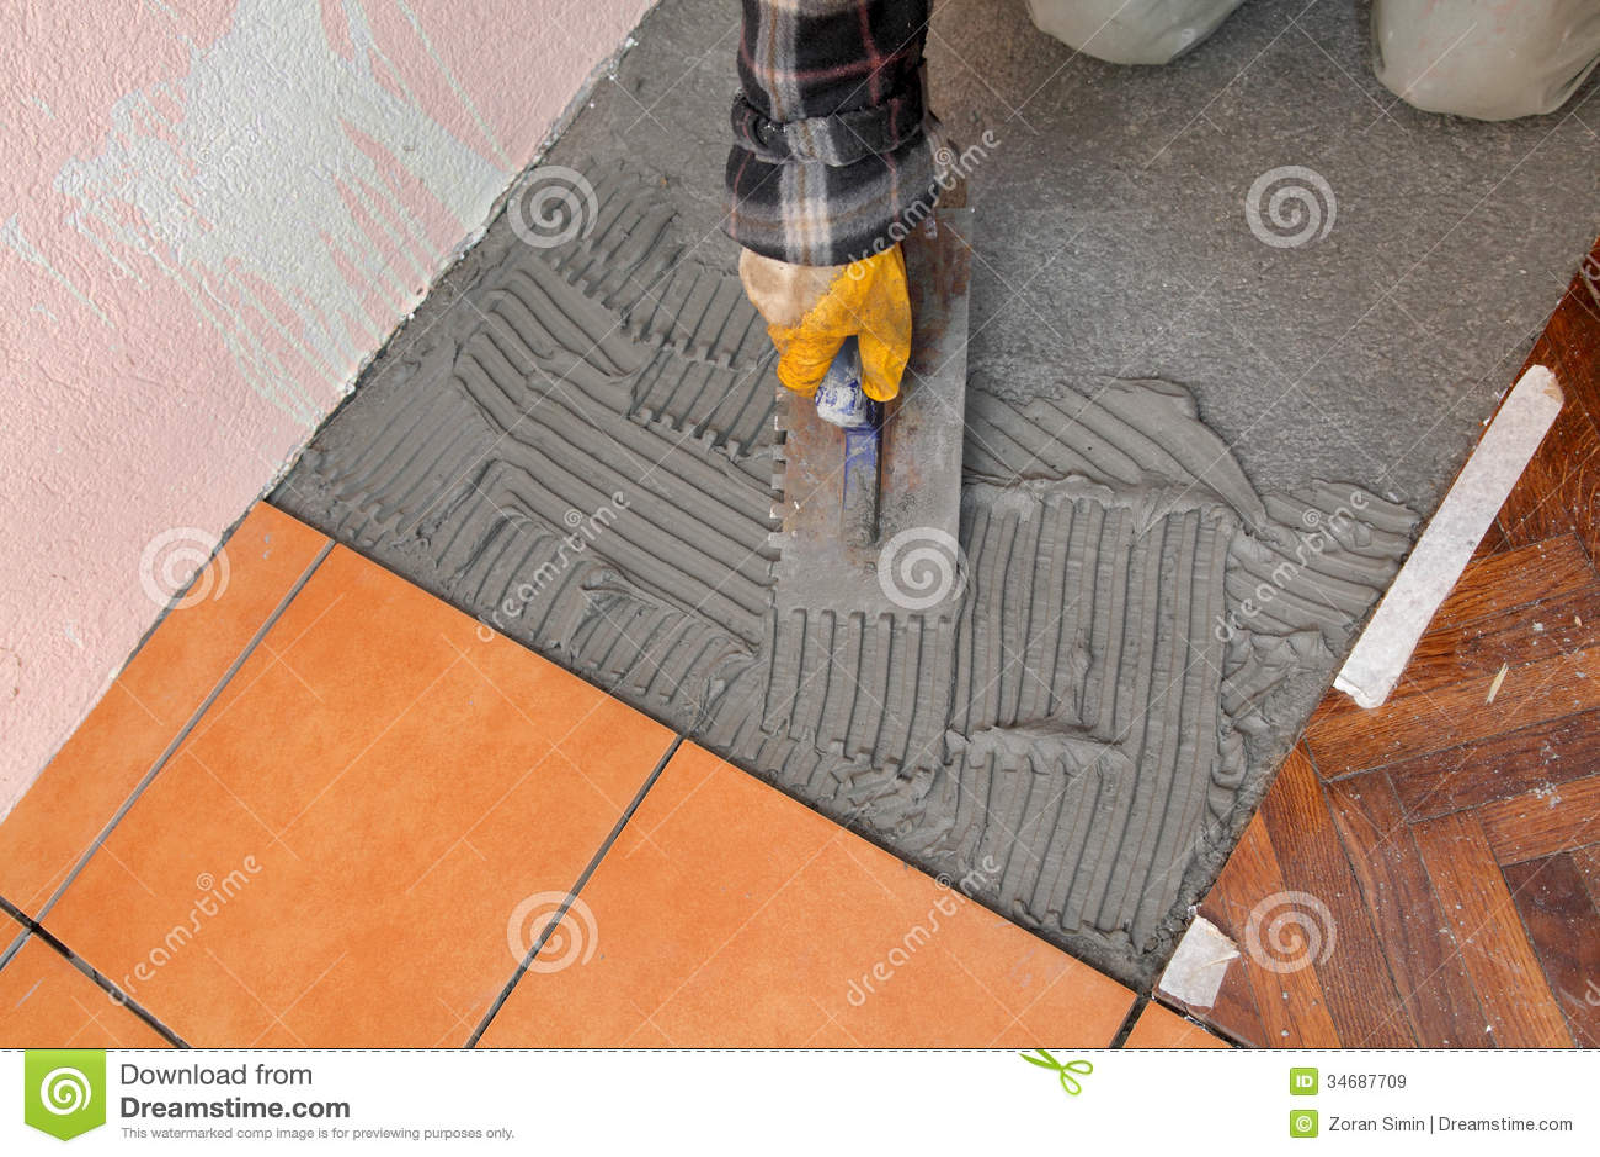 Home Renovation Tiles Stock Image Image Of Labor Placing 34687709